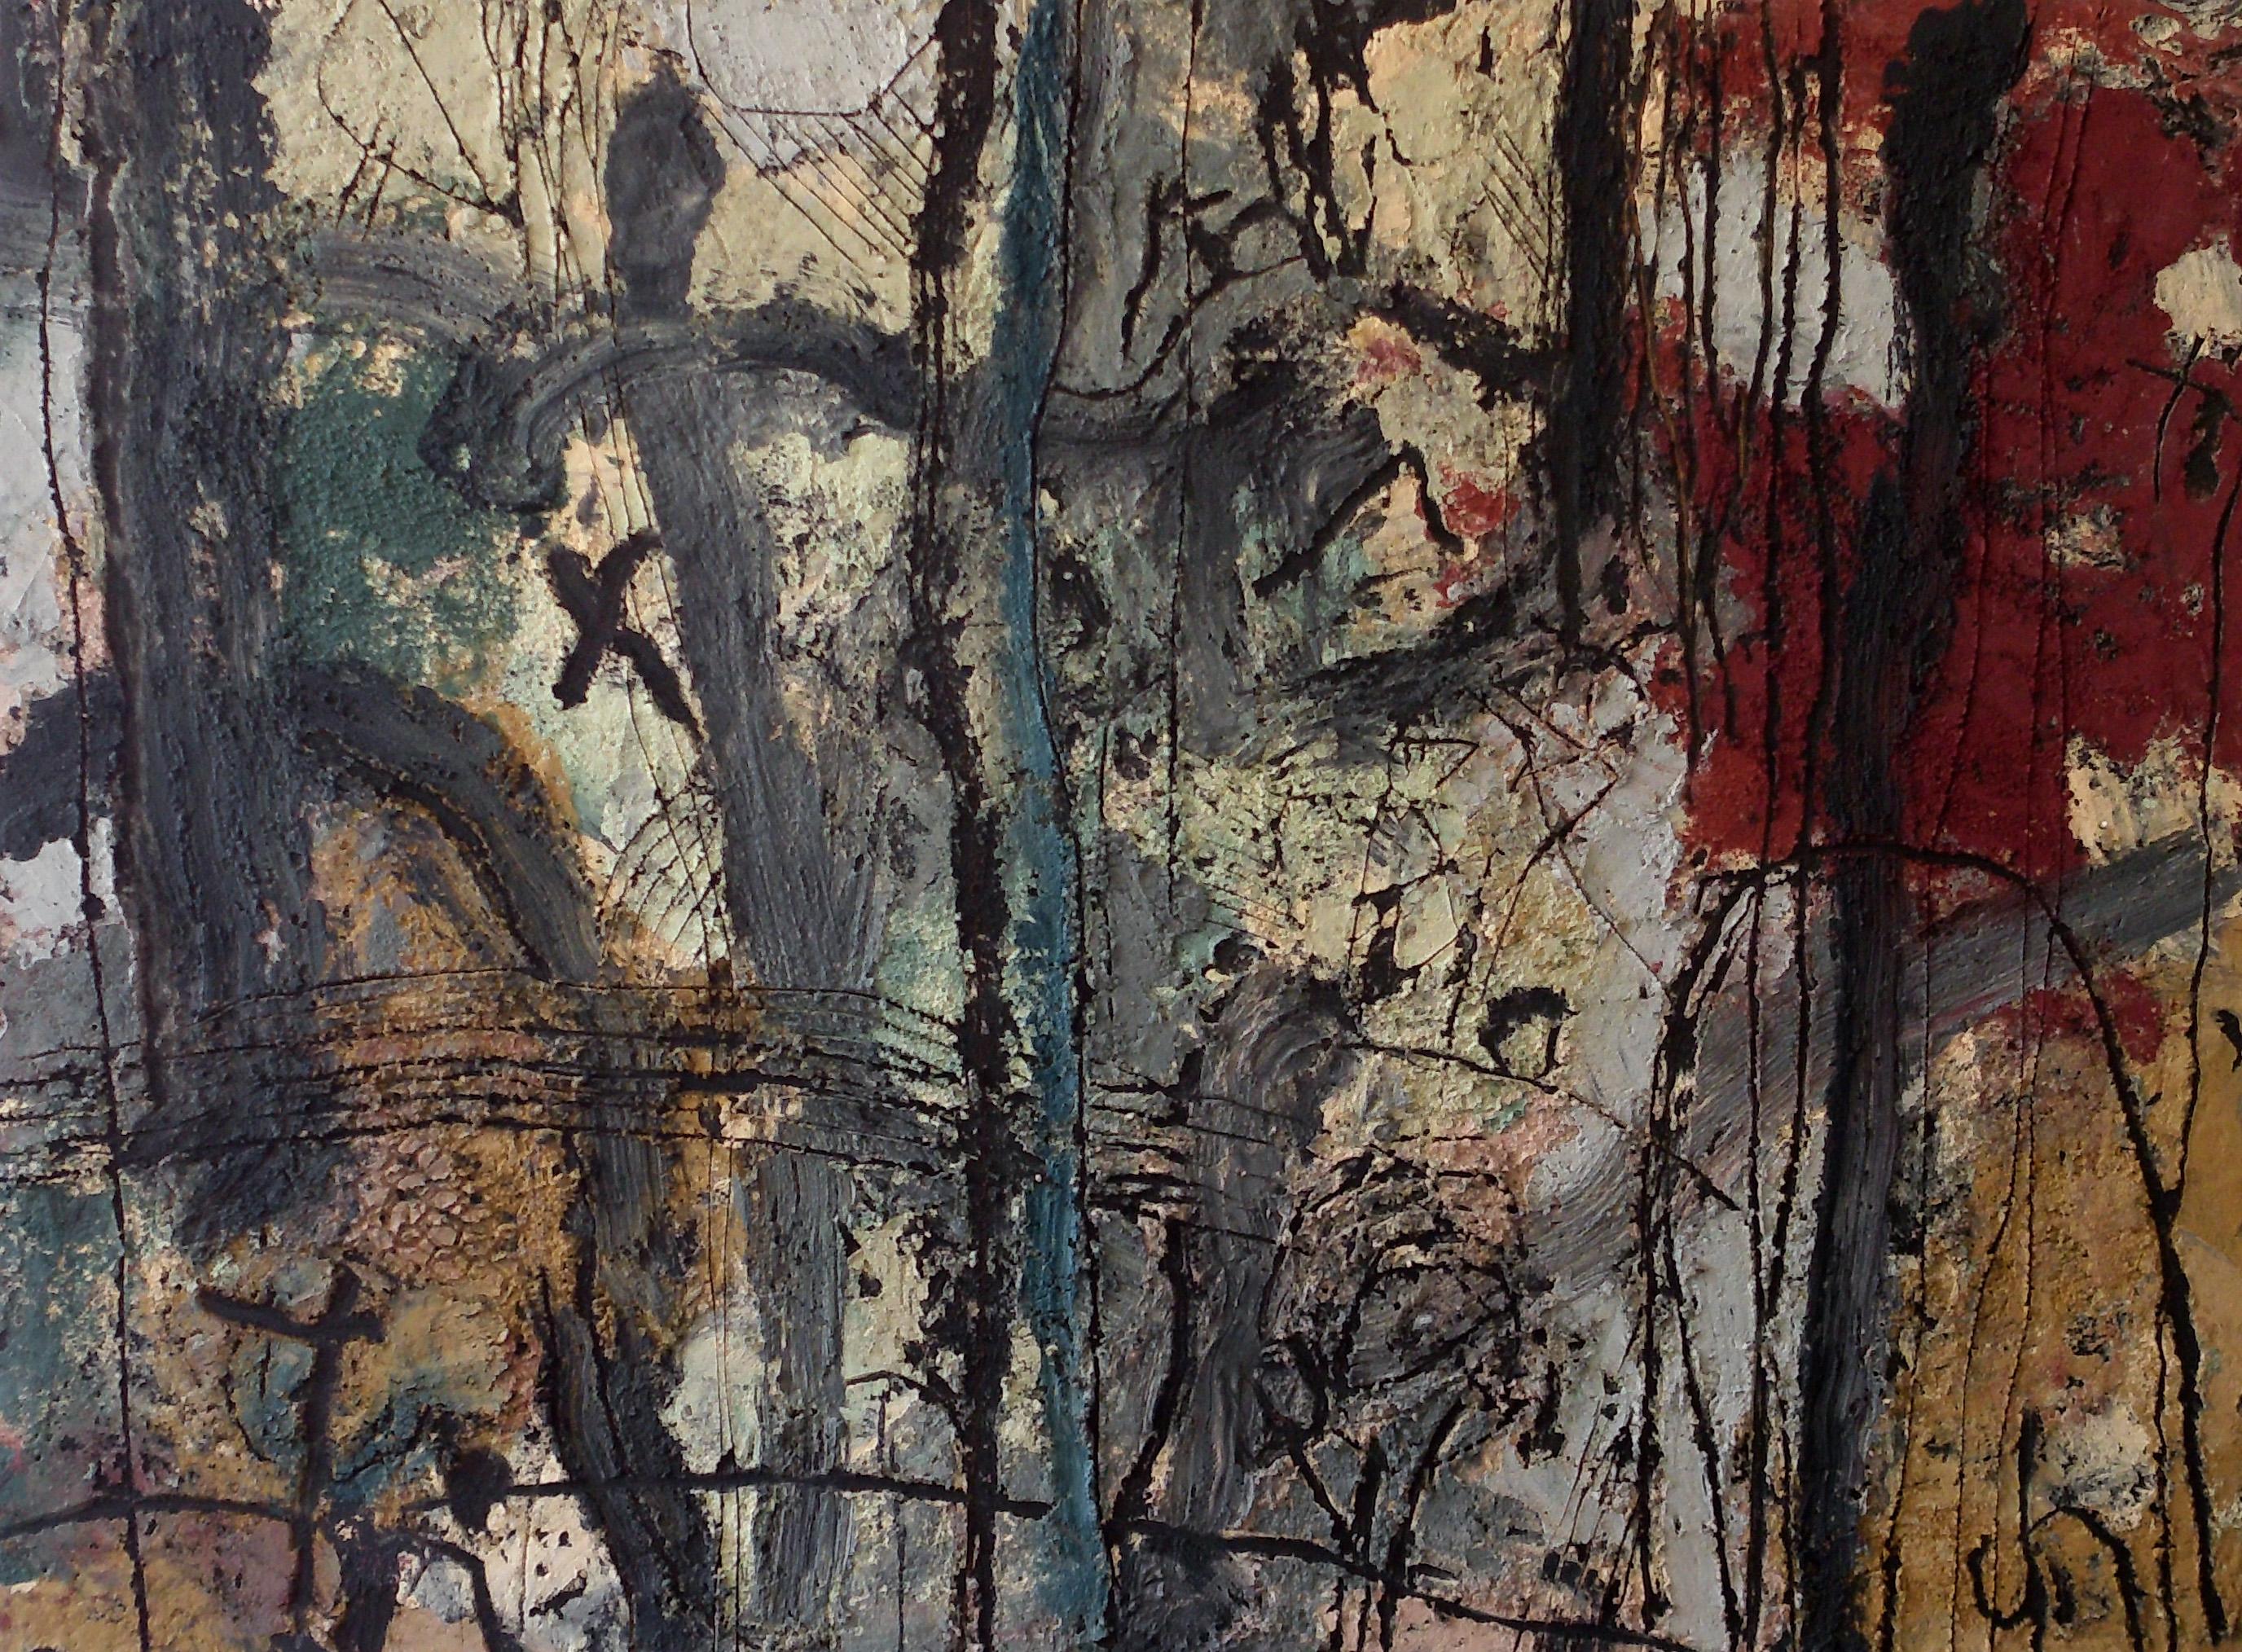 19-christian_hasse-komposition_04.08.11-2011-acryl_auf_hartfaser-91x122